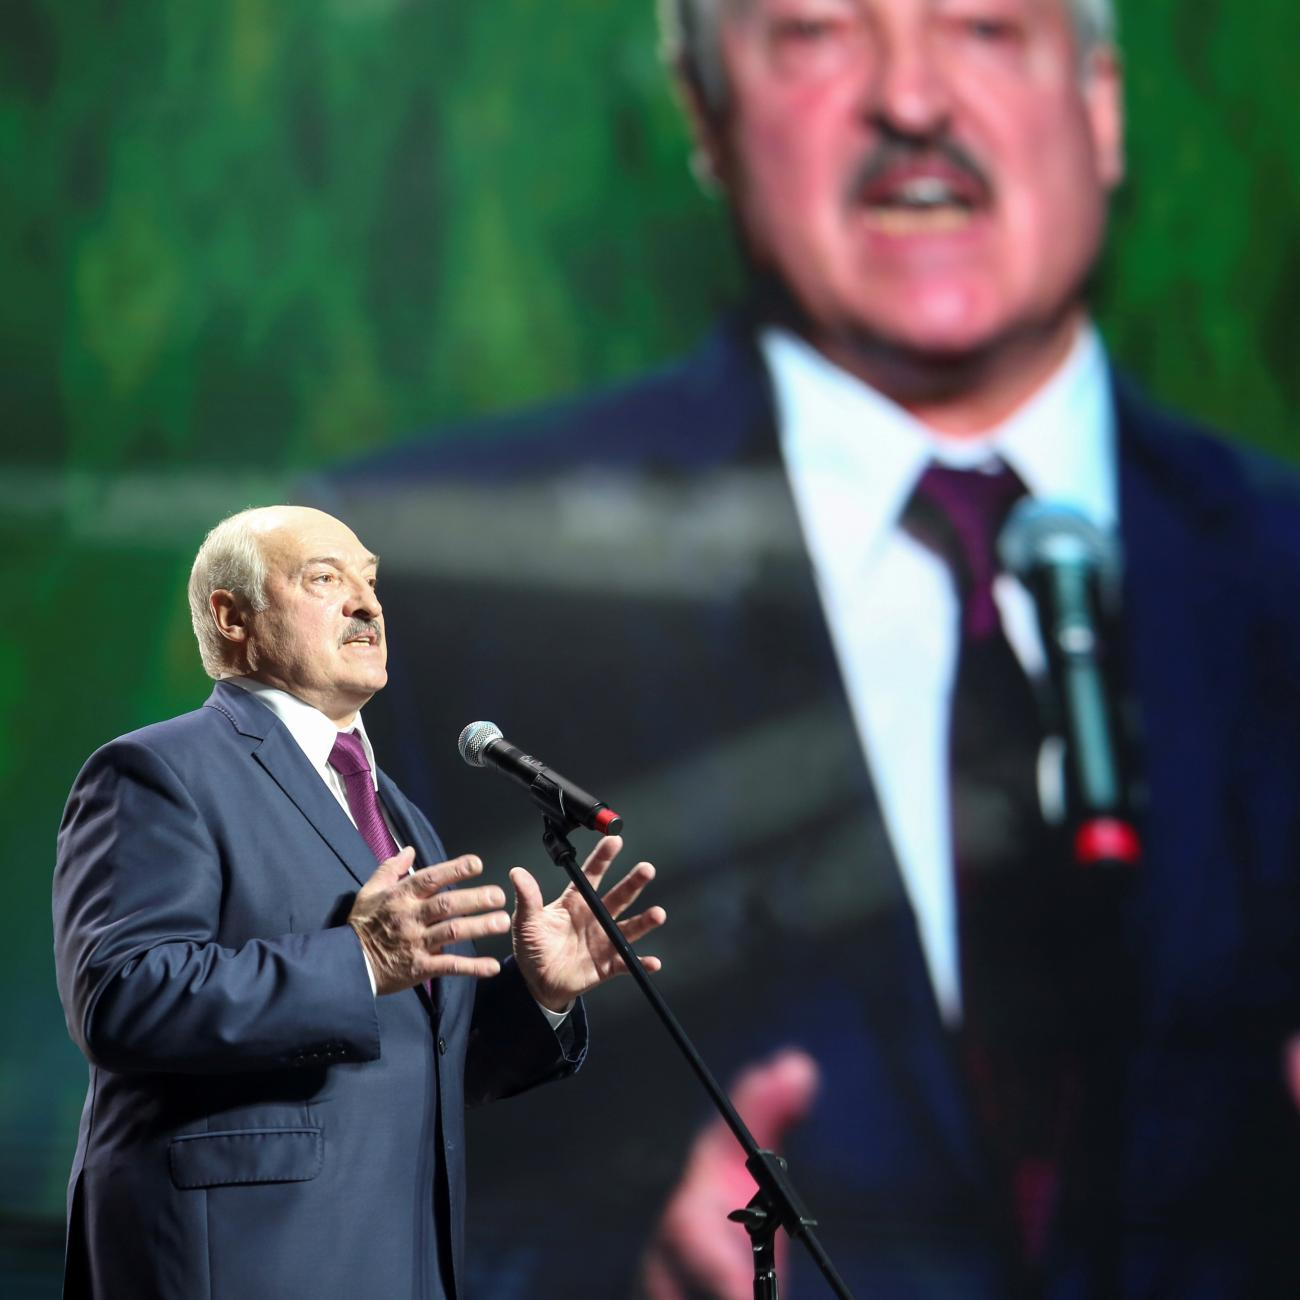 https://www.thinkglobalhealth.org/sites/default/files/styles/max_1300x1300_1_1/public/2020-10/TGH_Sethy_Kiernan_Lukashenko_1x1.jpg?itok=EwTbzcxF